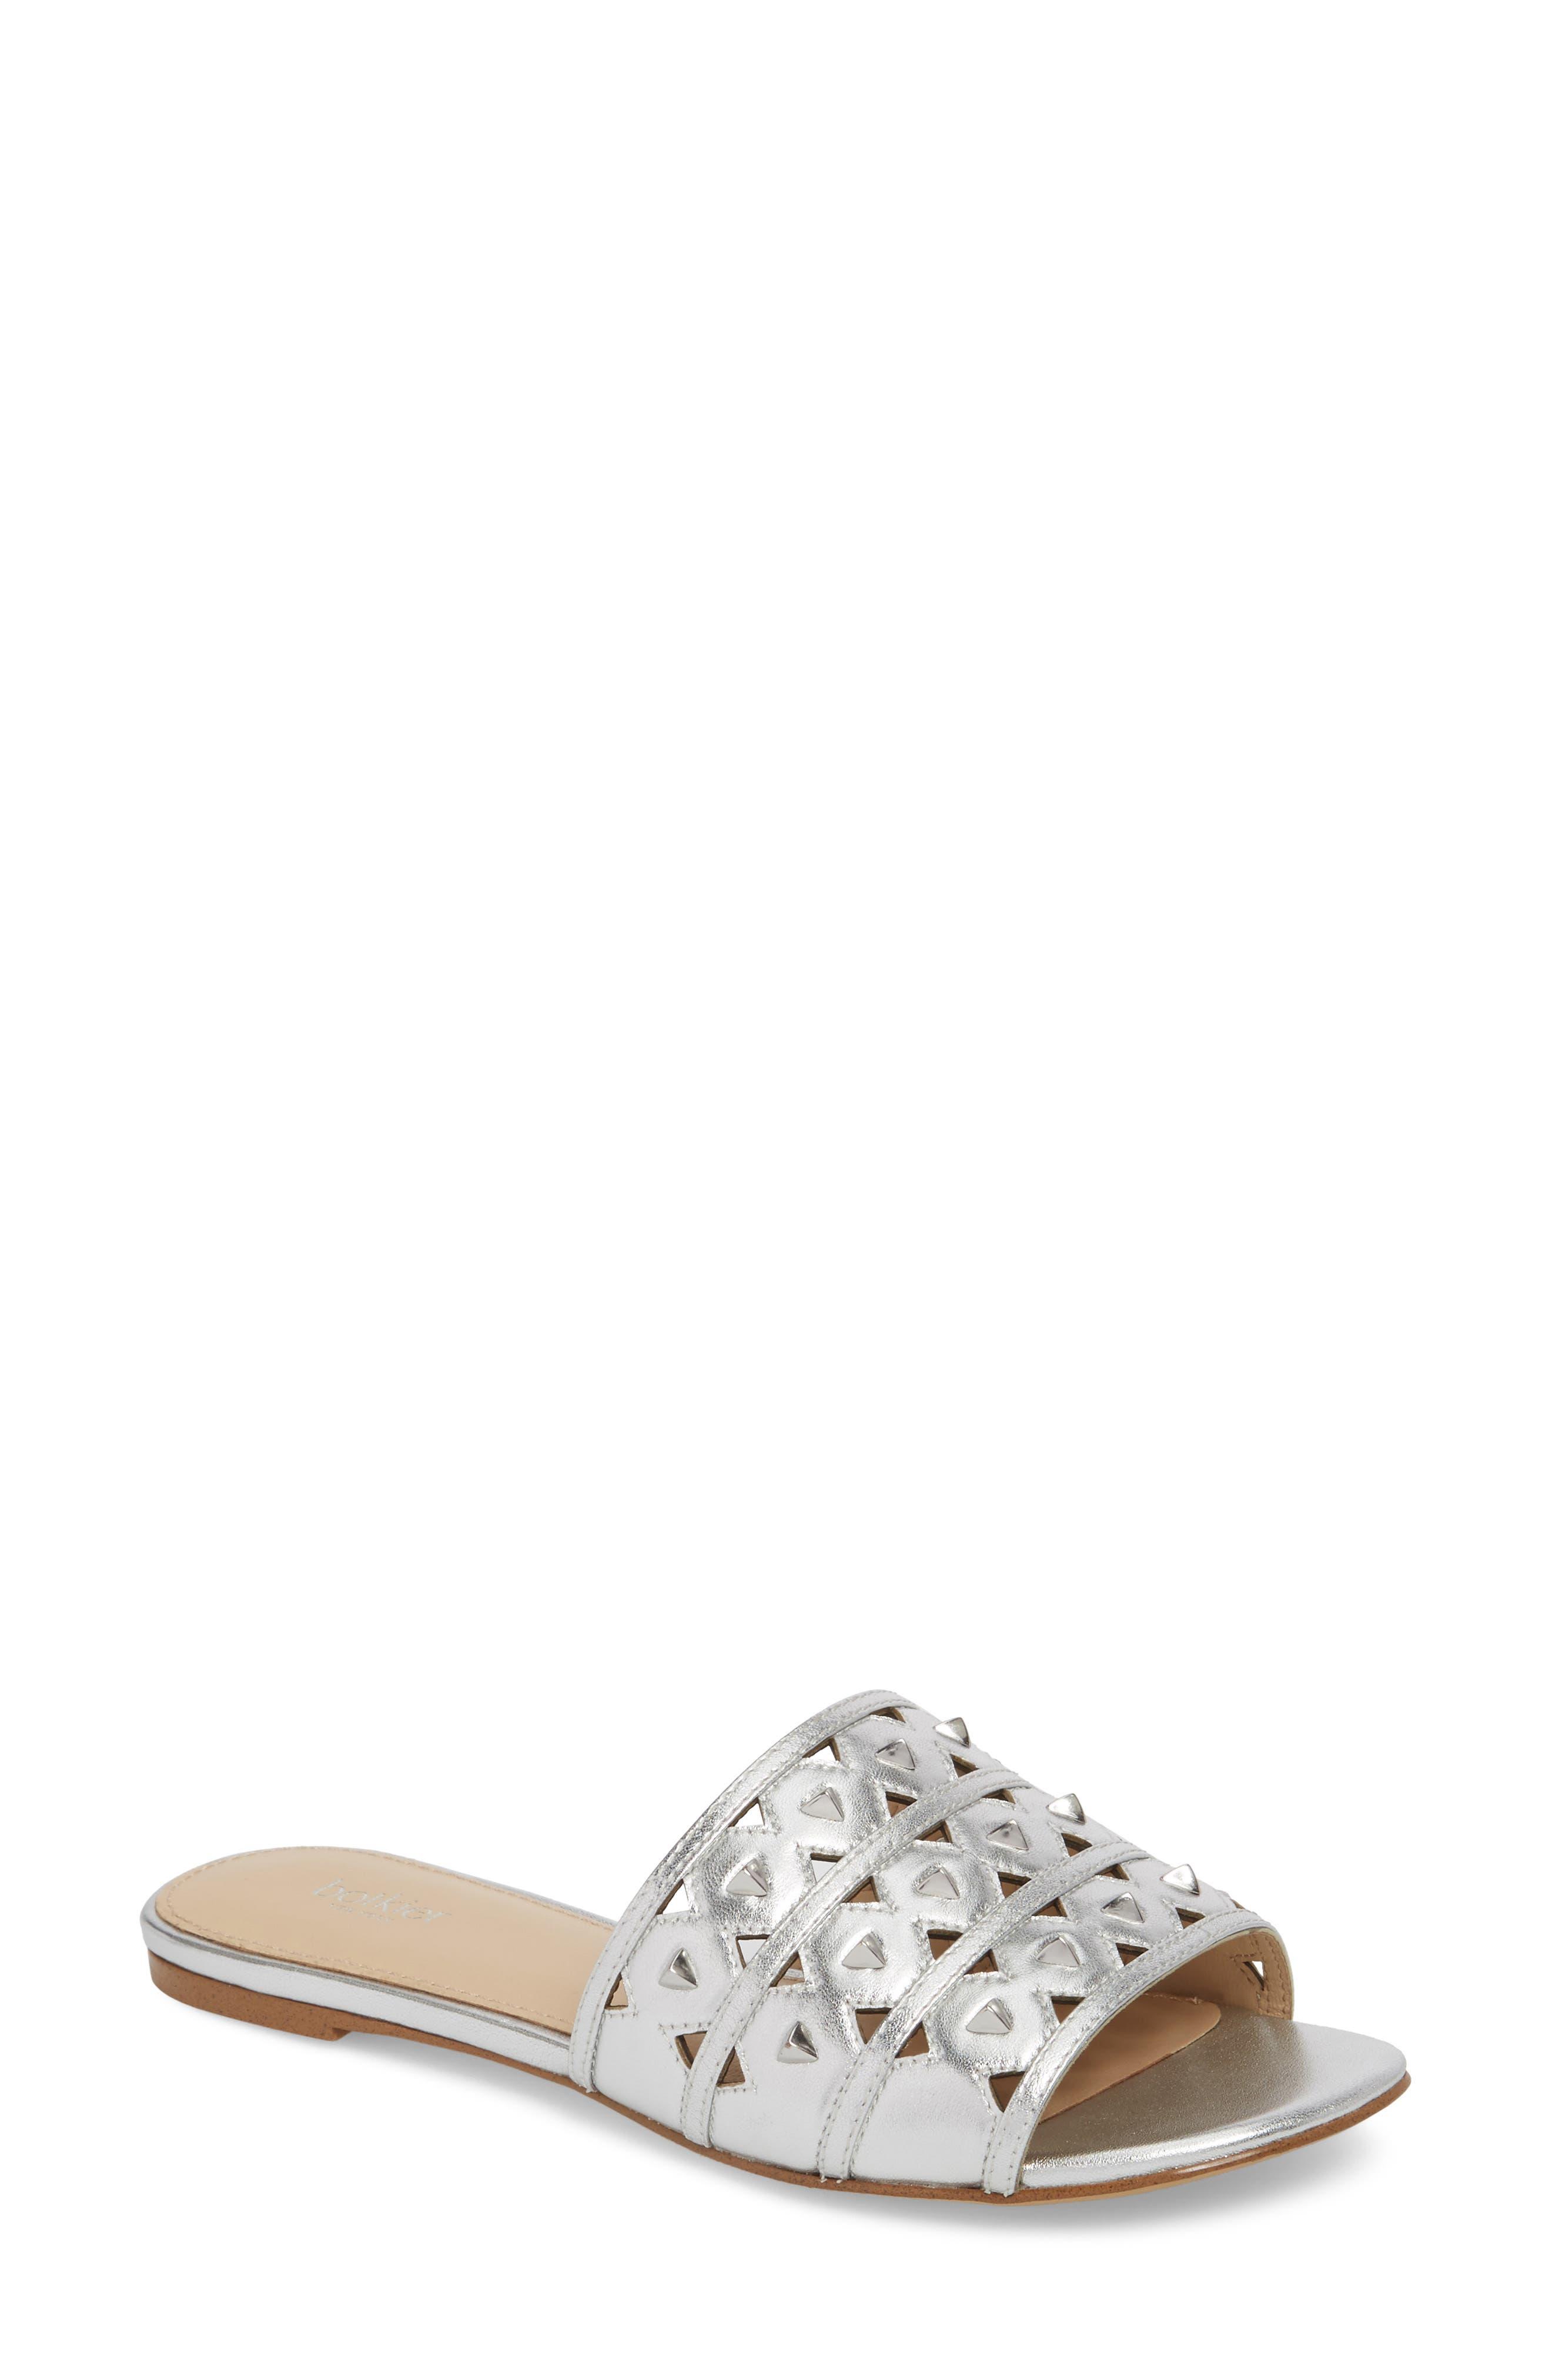 Maeva Slide Sandal,                         Main,                         color, Argento Leather